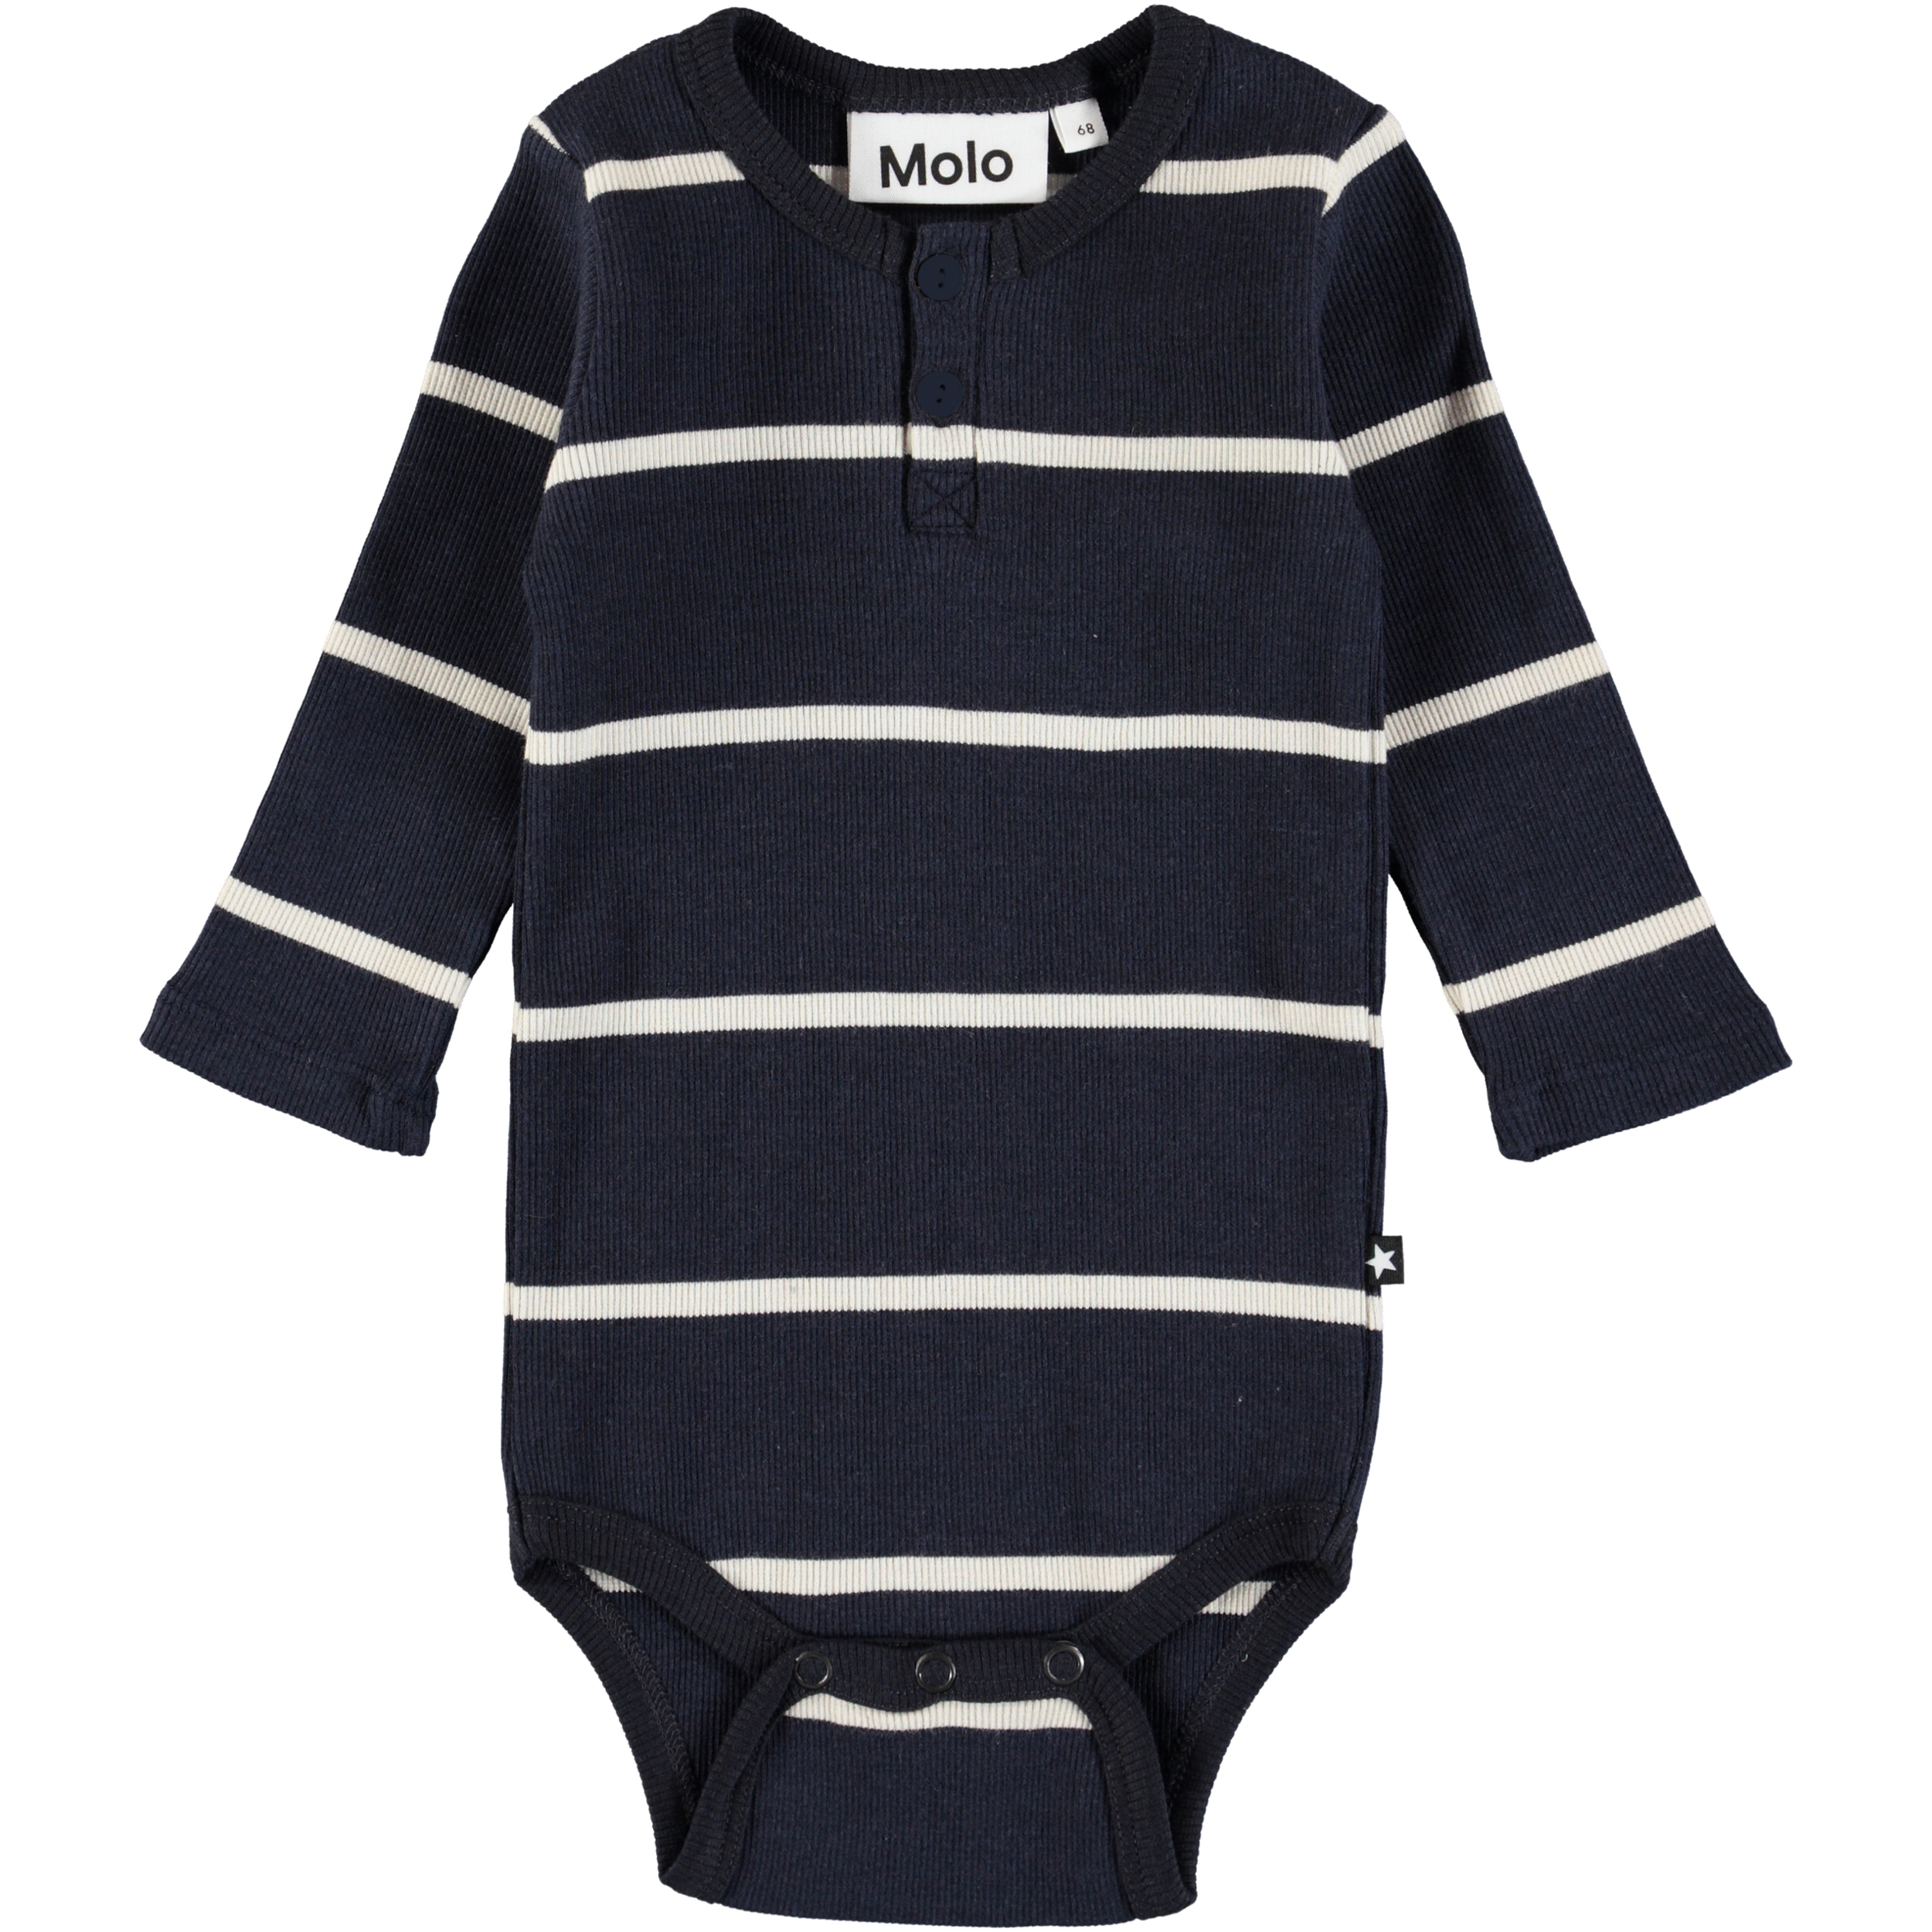 492eb3c17ecb Falk. Click to zoom. Falk - Dirty White Stripe - Long sleeve, striped baby  ...